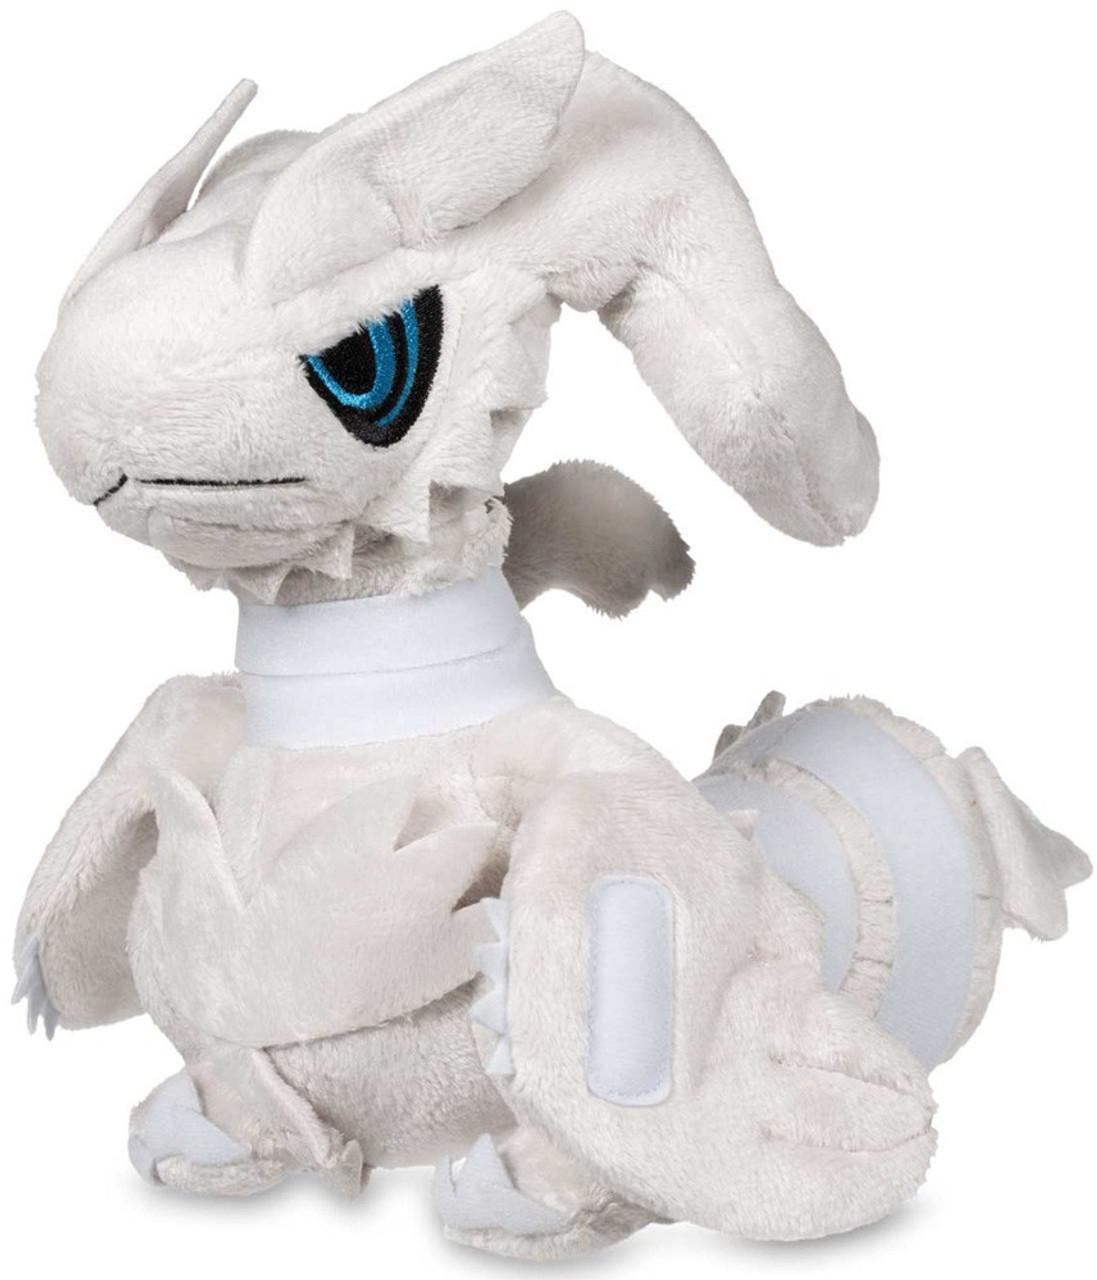 "Plush New Pokemon RESHIRAM STUFFED TOY Doll Figure 12/""H"